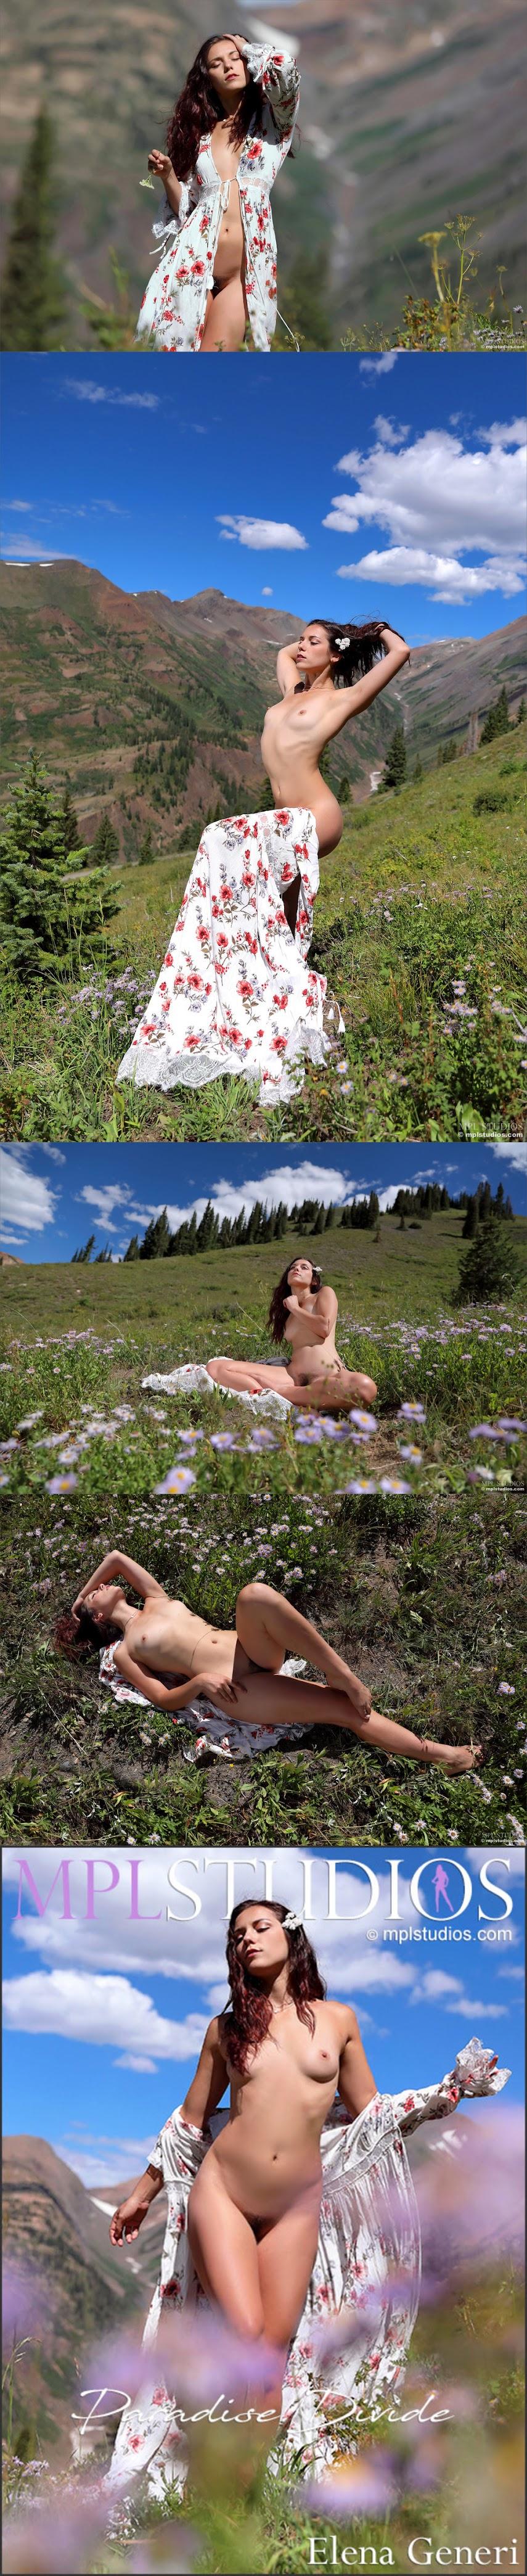 001611 [MPLStudios] Elena Generi - Paradise Divide